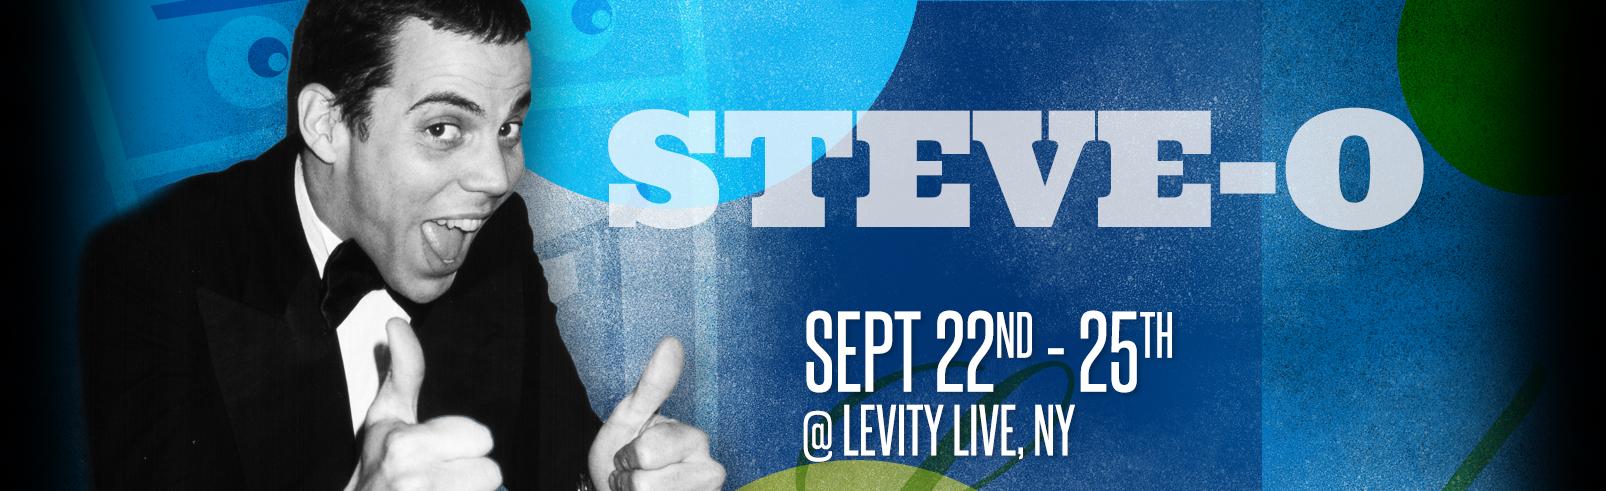 Steve-O @ Levity Live